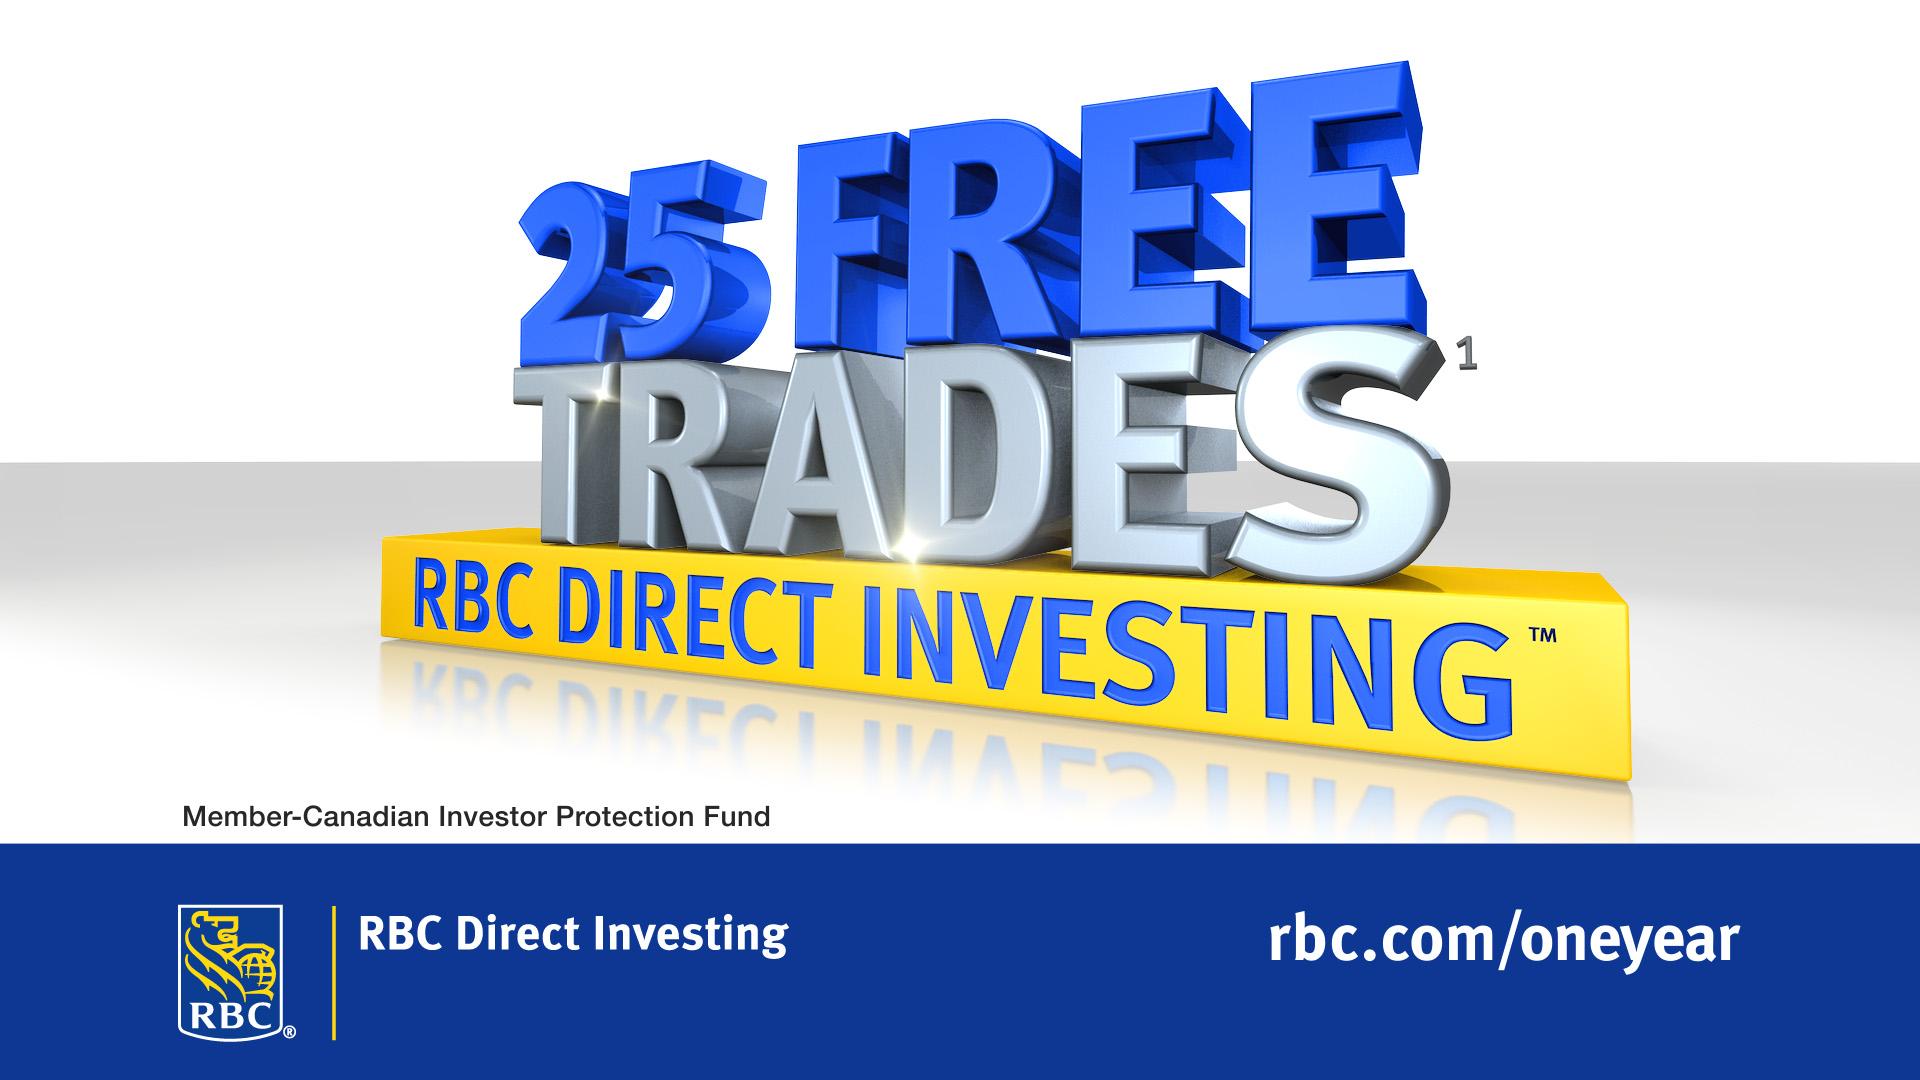 rbc_directinvesting_image02